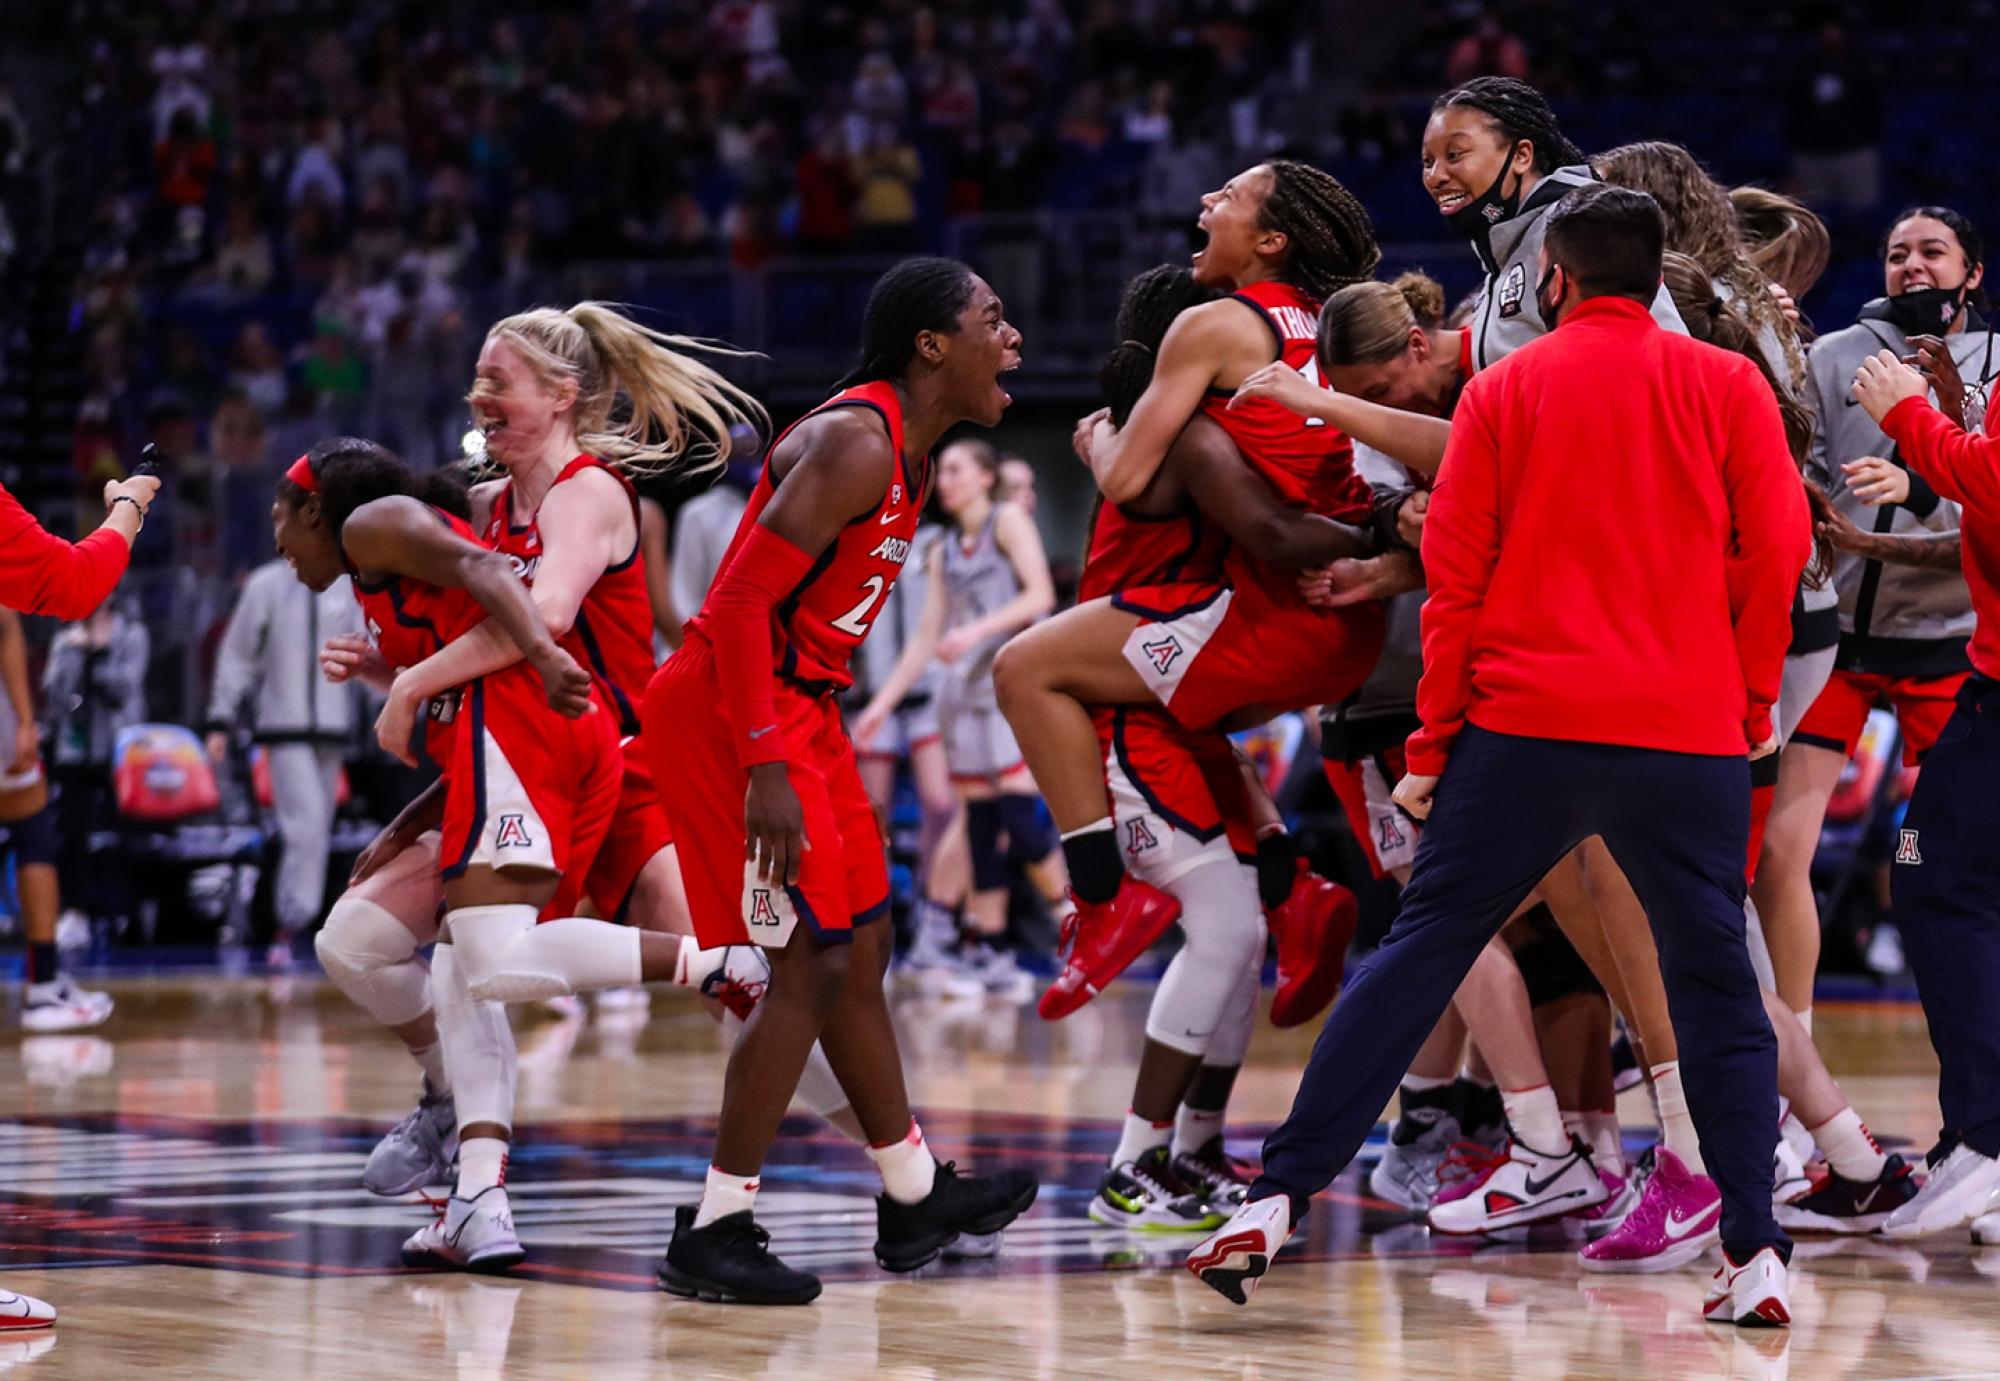 basketball players celebrating